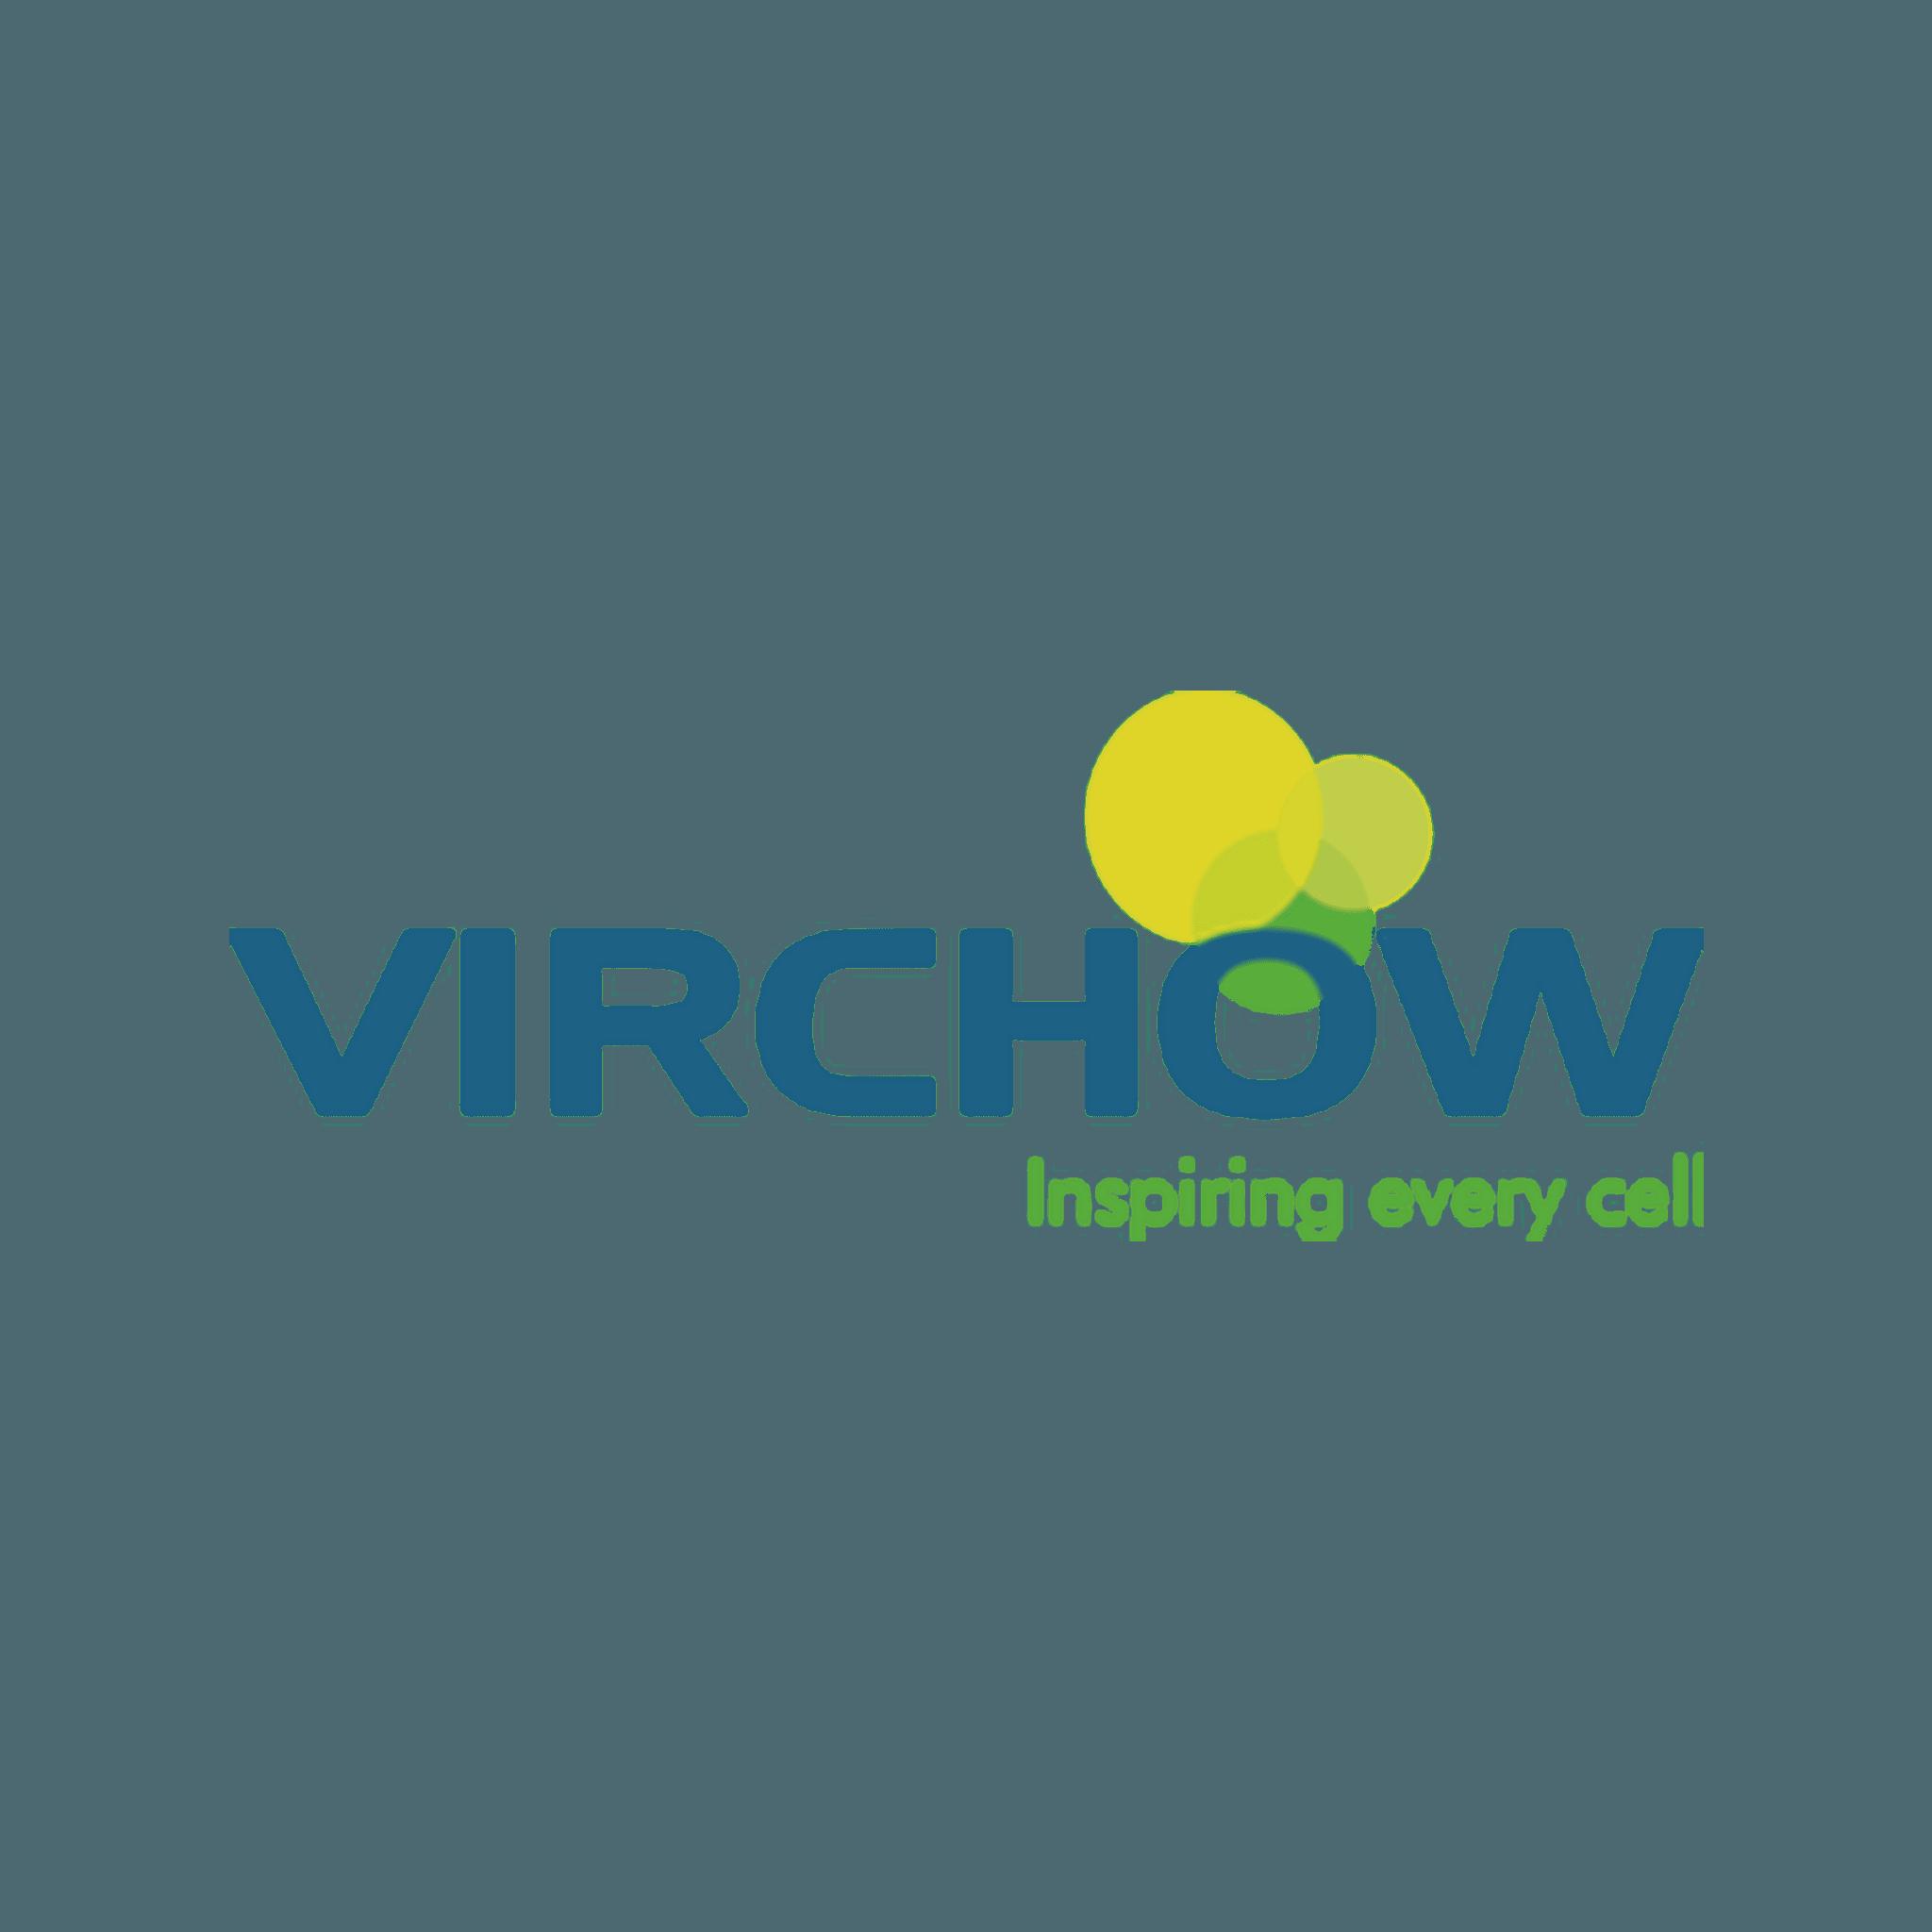 Virchow Healthcare Logo